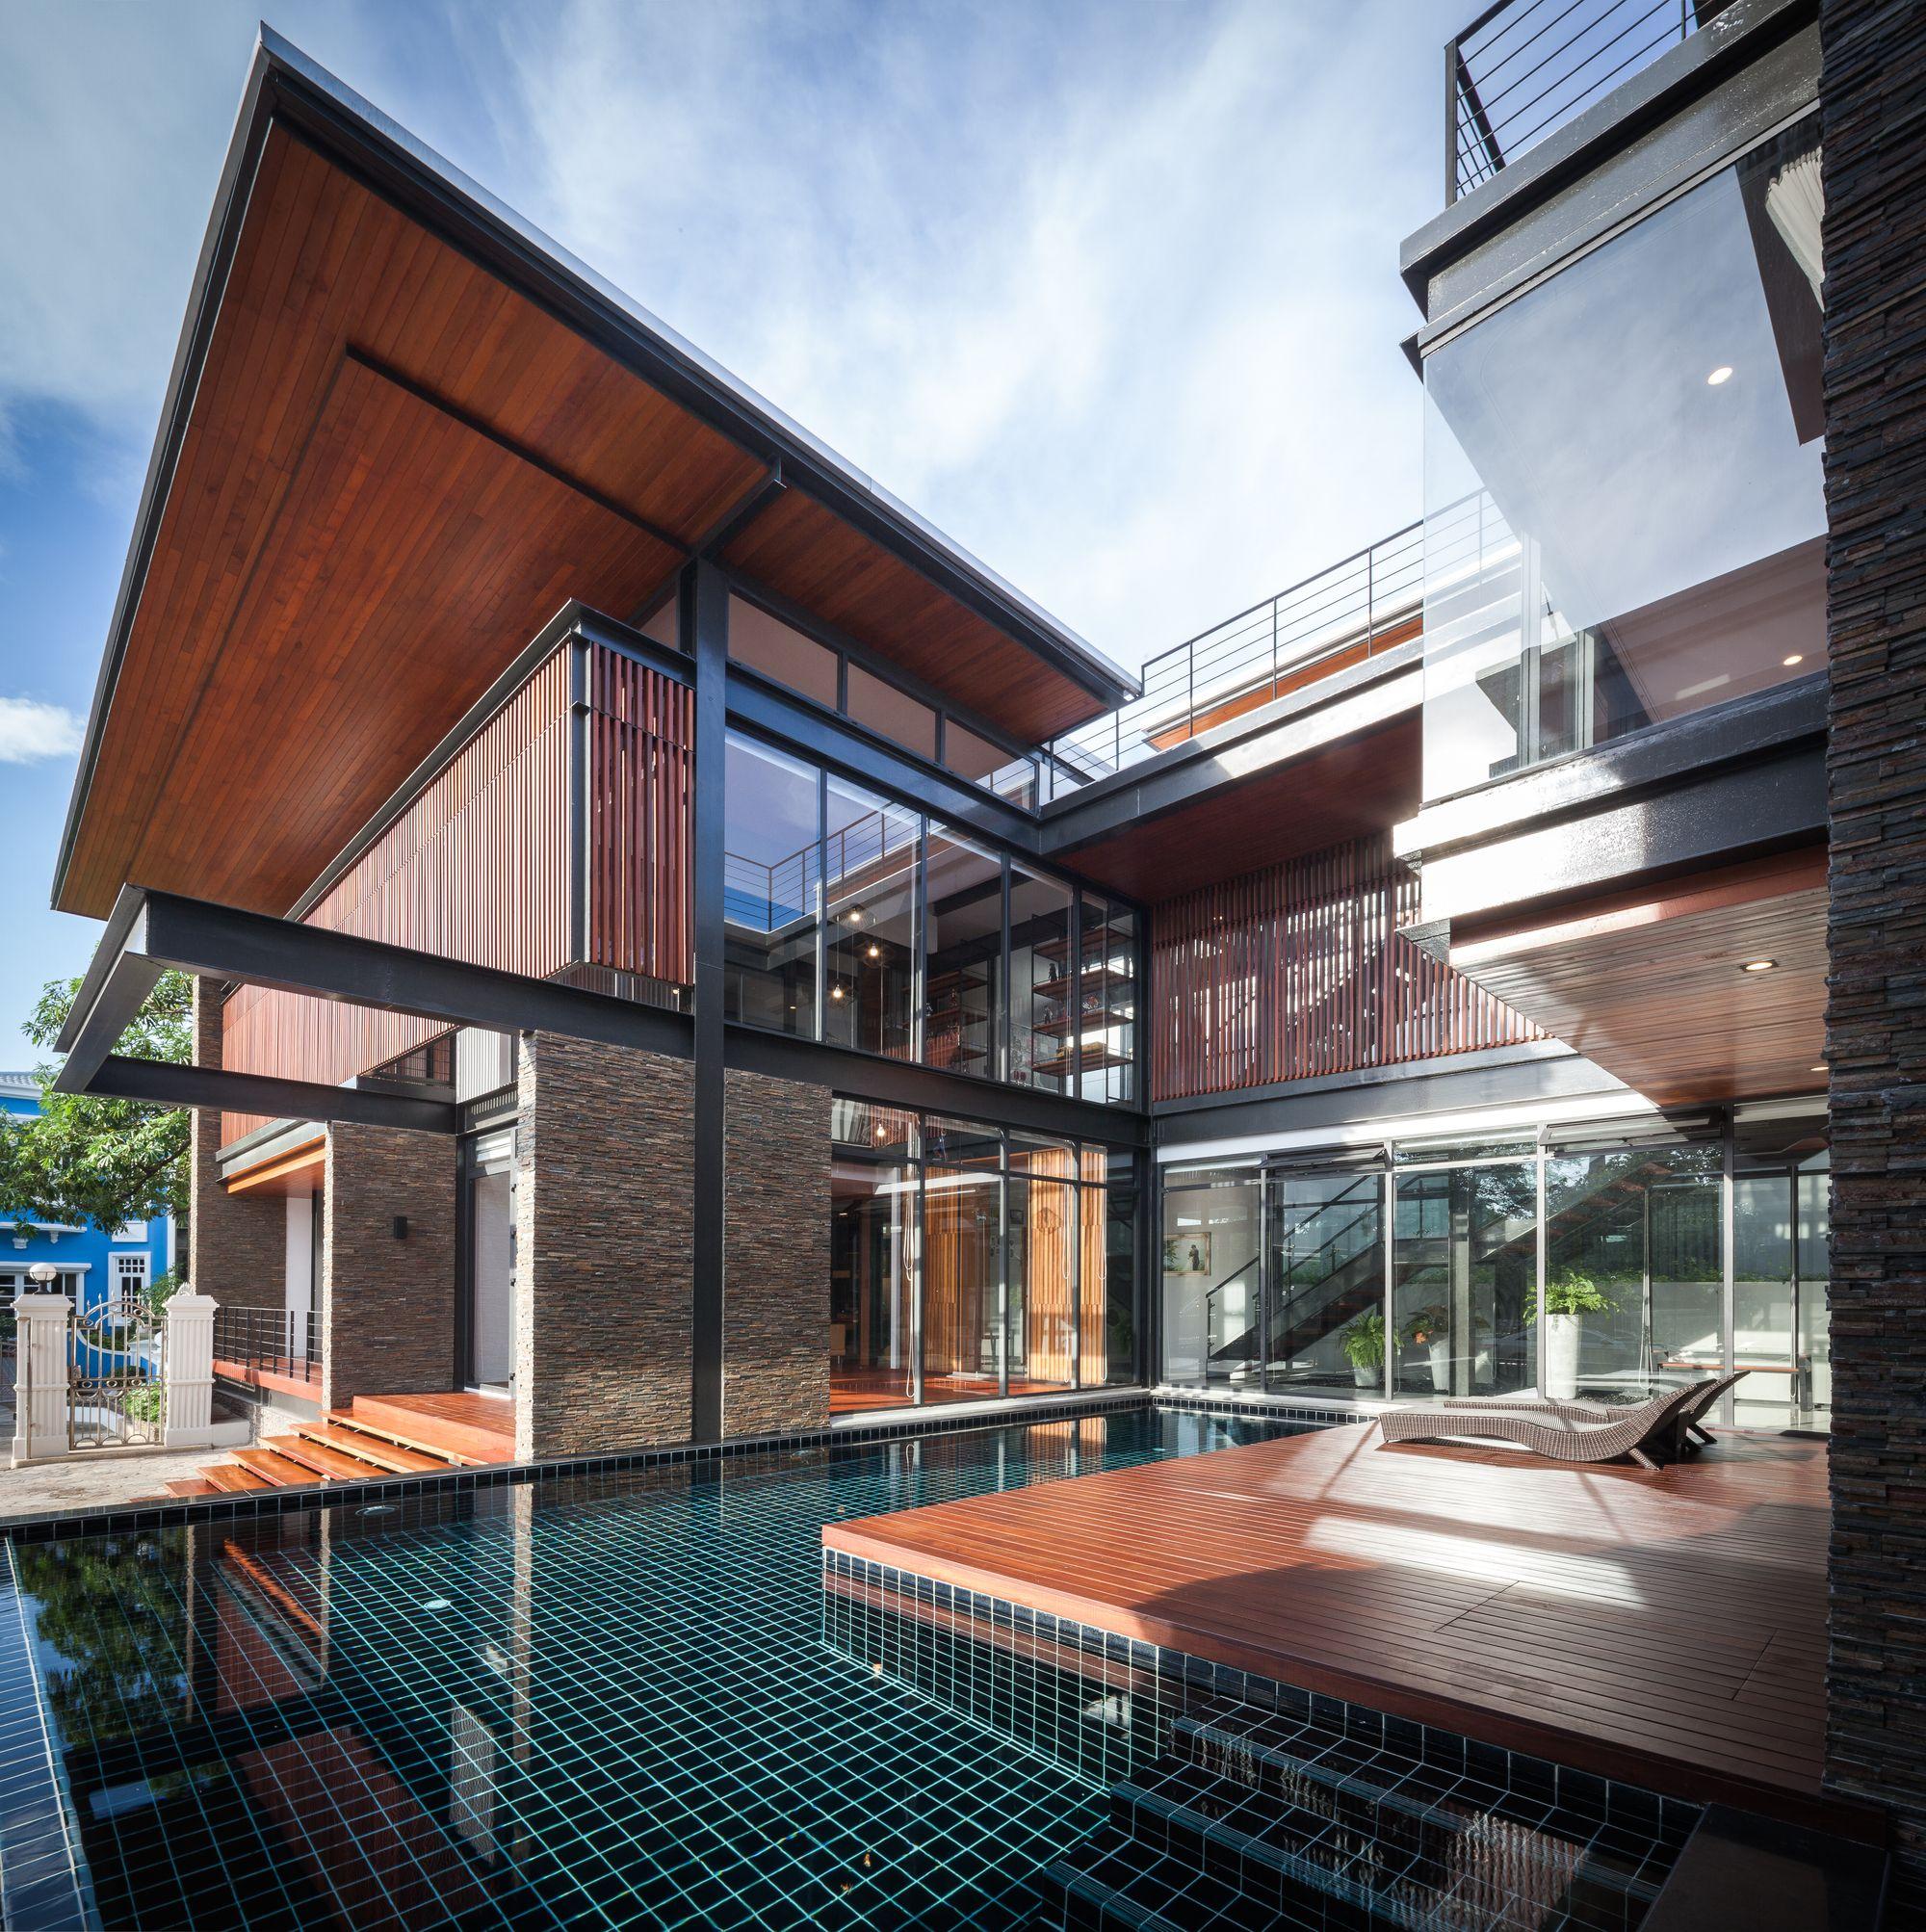 Bridge House / Junsekino Architect And Design | Pinterest ...